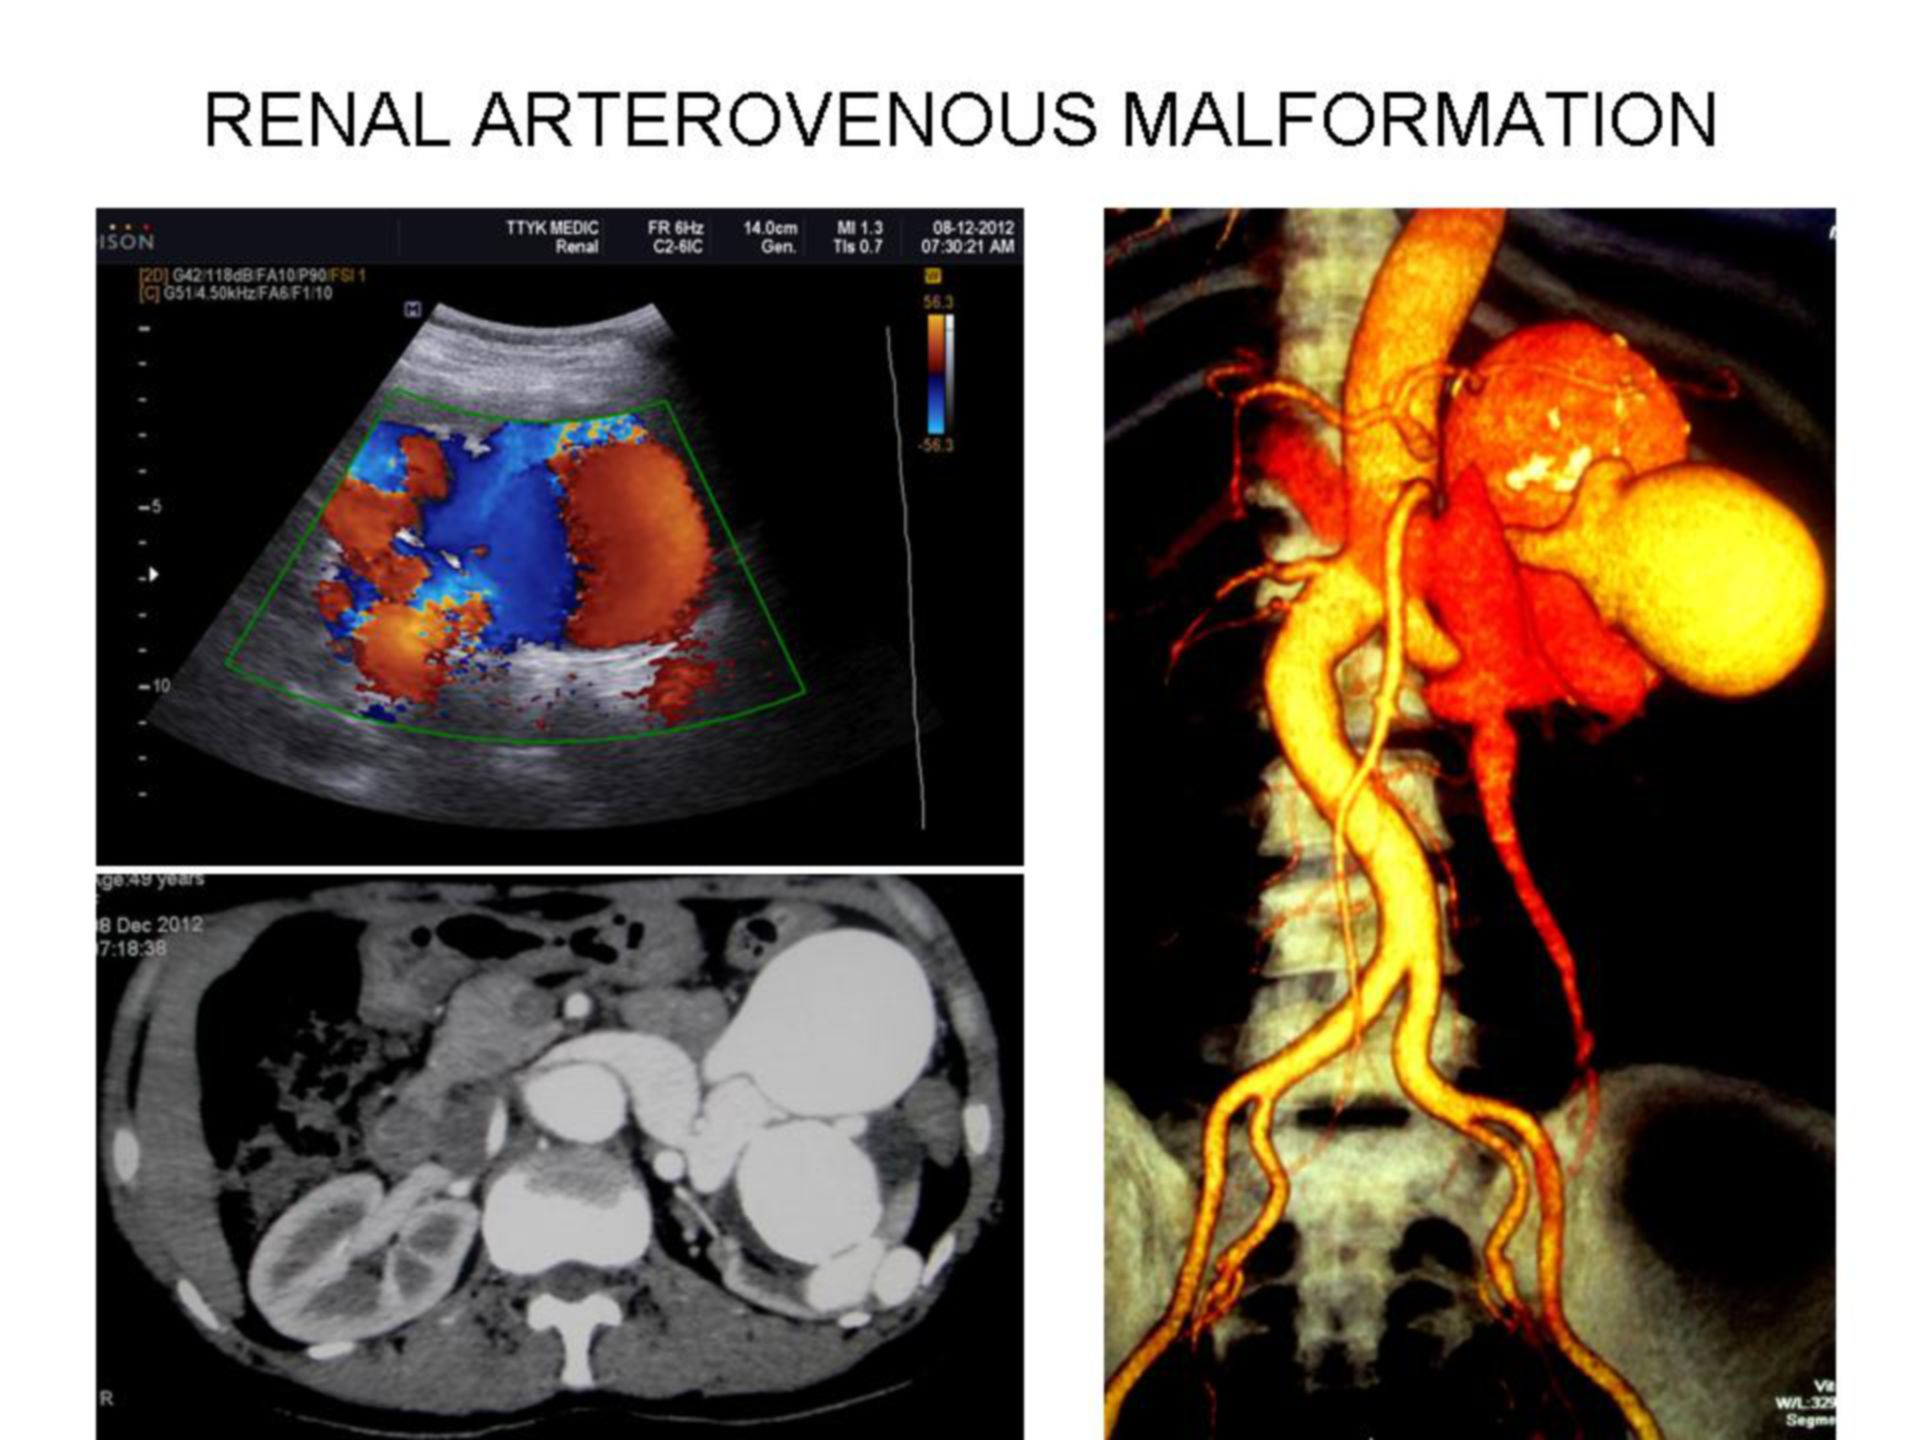 Renal Arterovenous Malformation